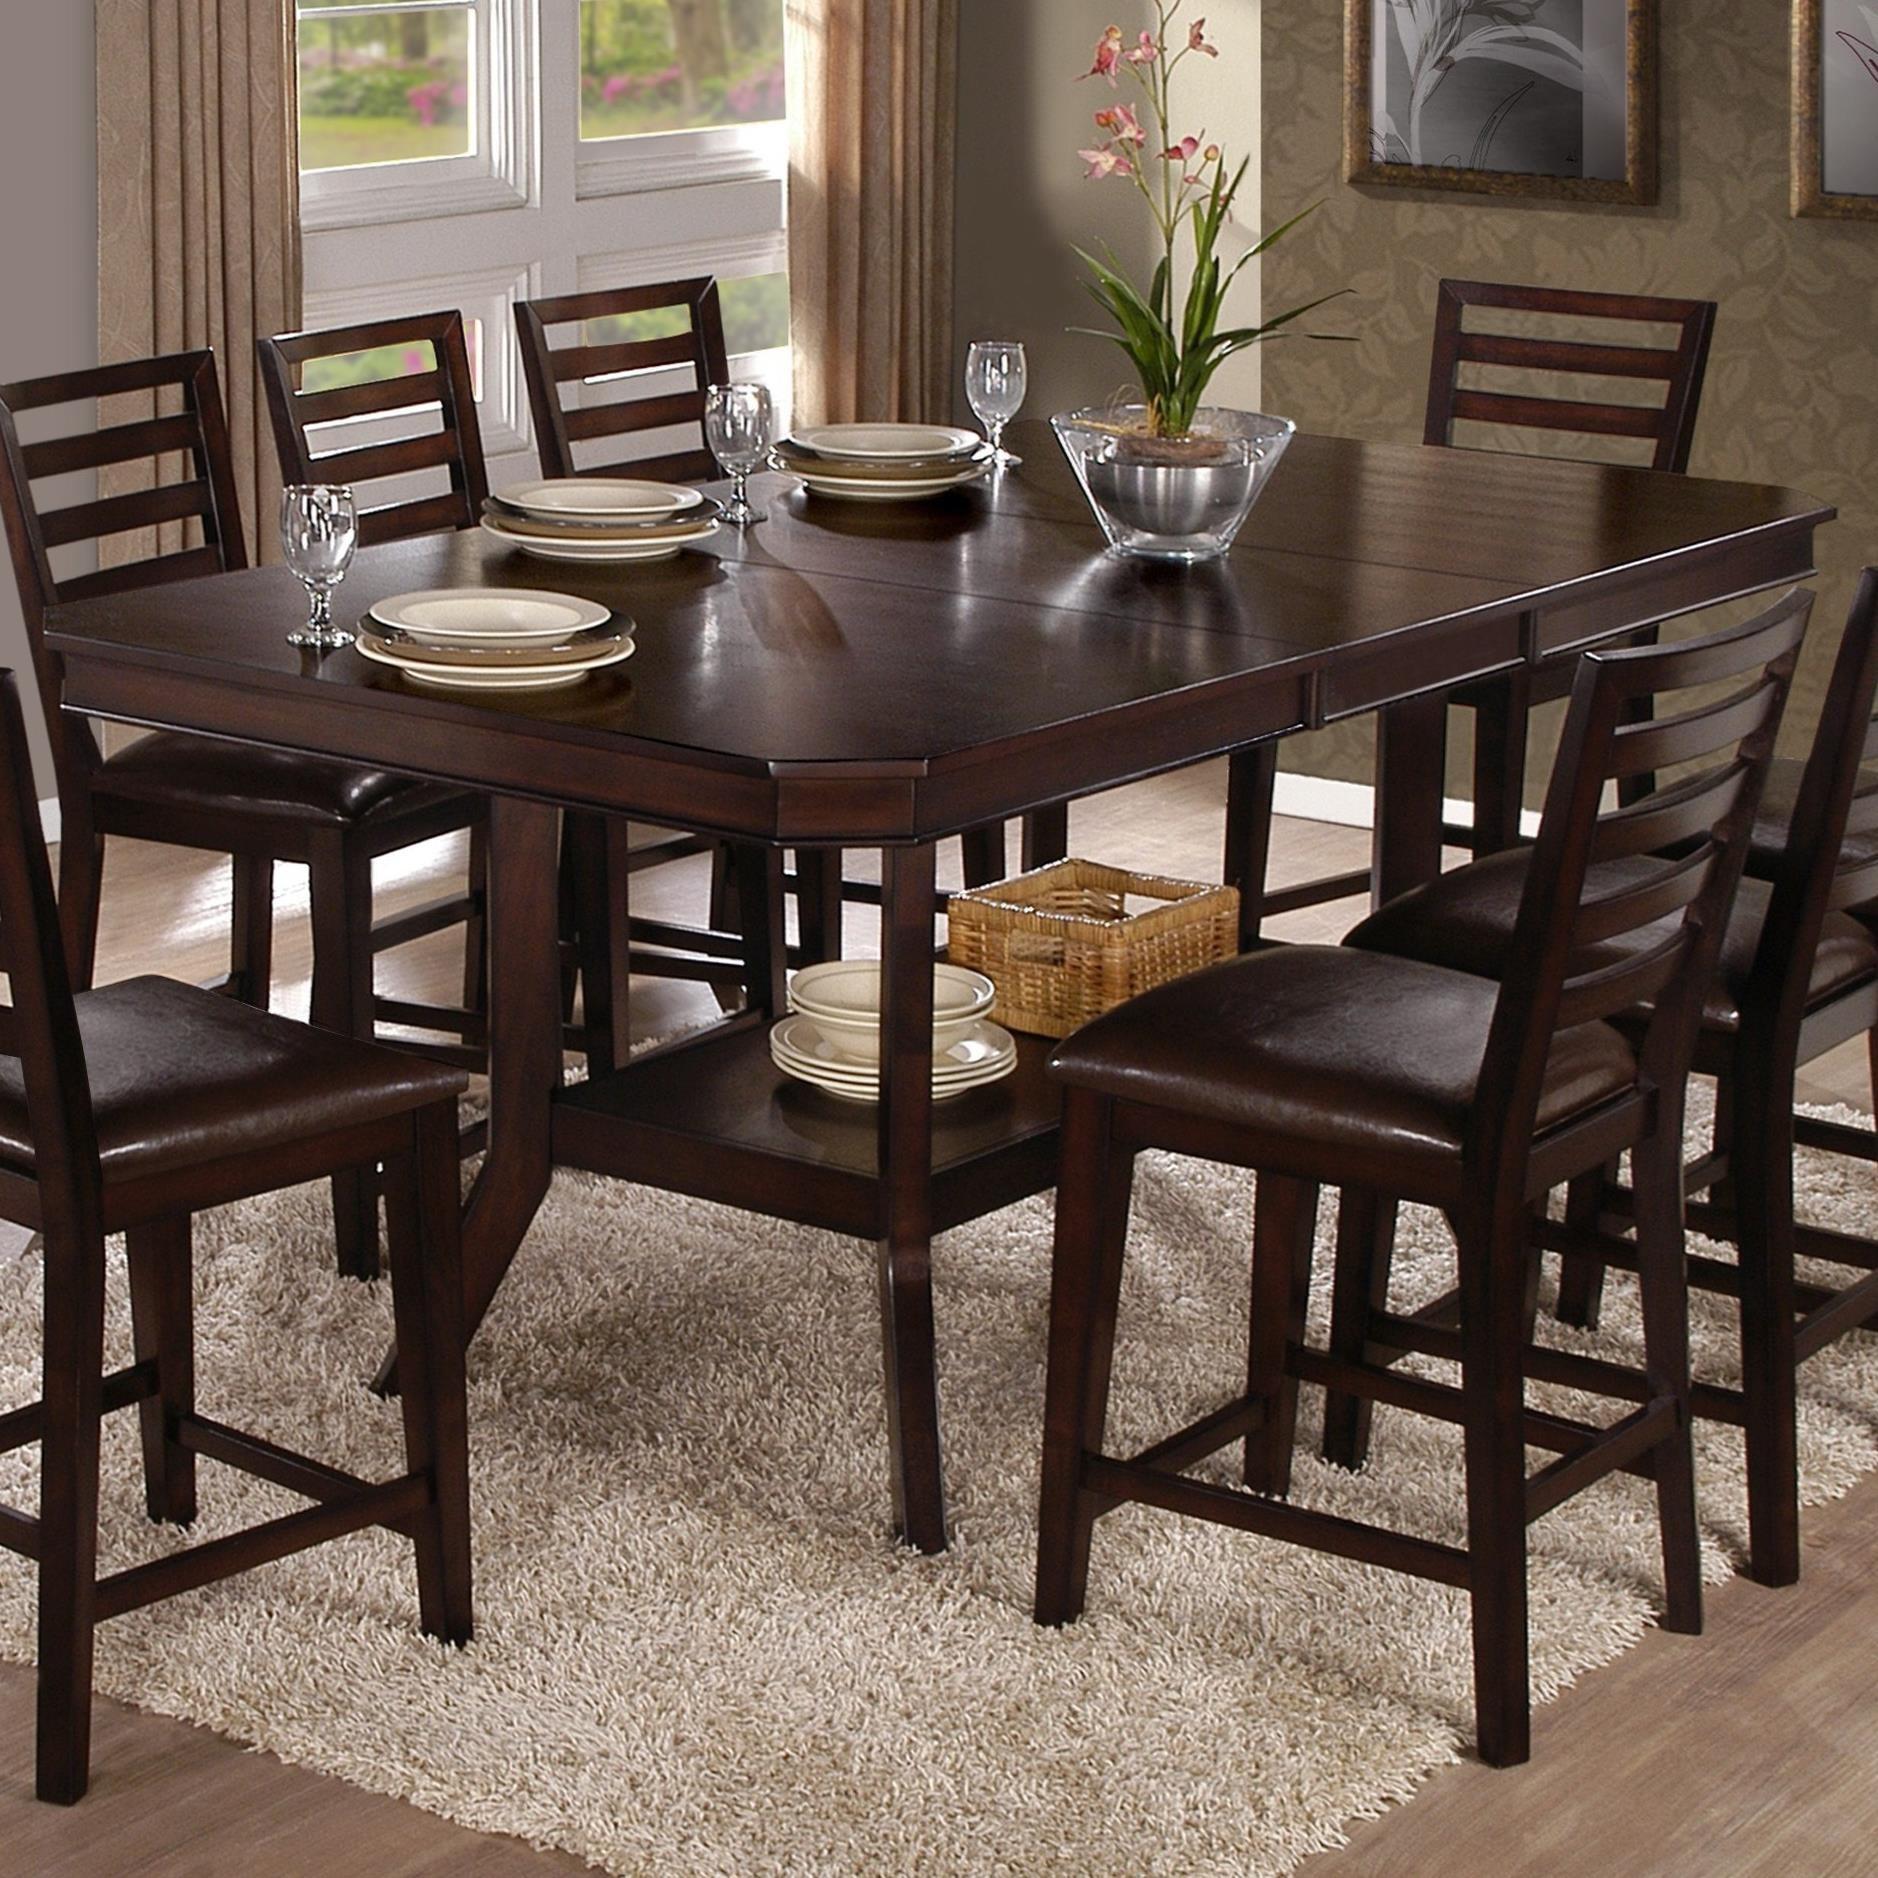 Progressive Furniture Bobbie Counter Table - Item Number: P832-12